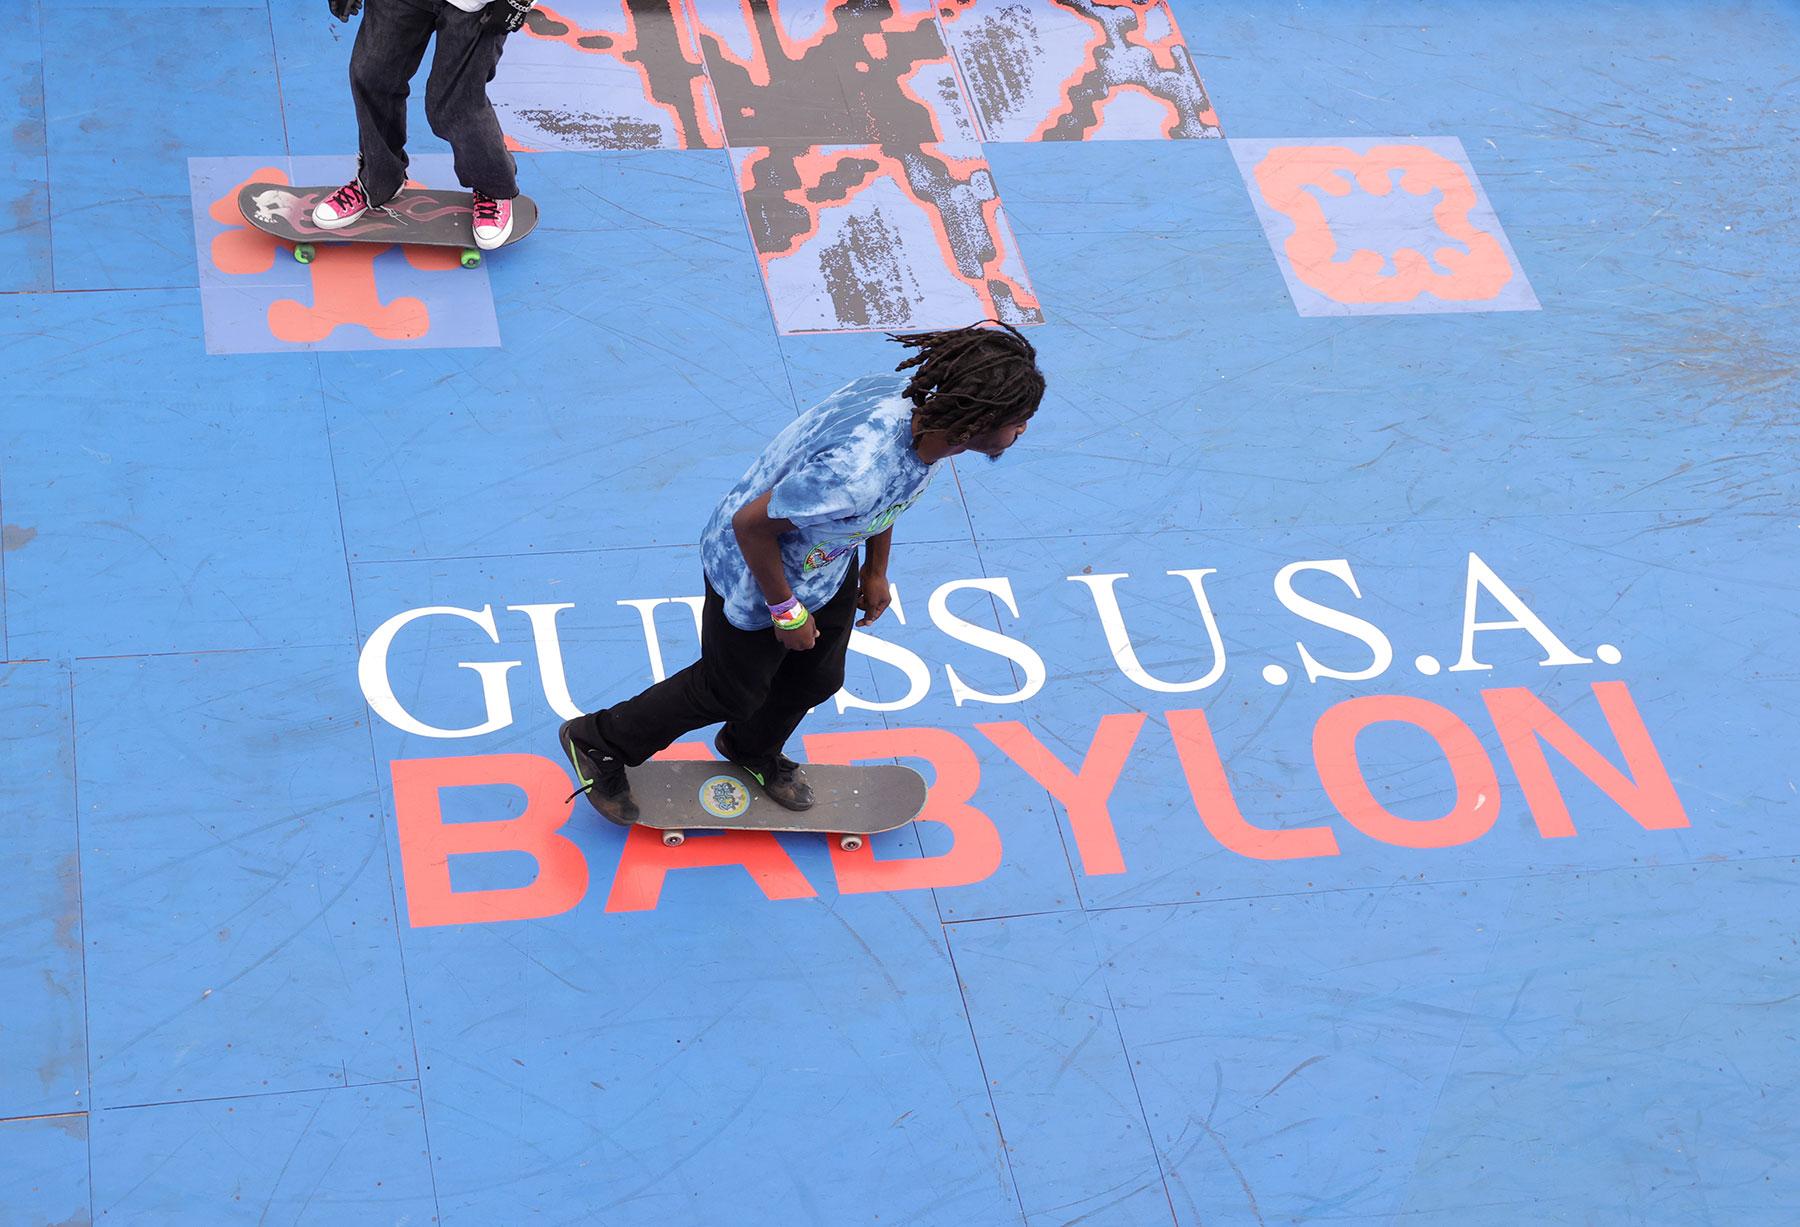 GUESS USA X BABYLON